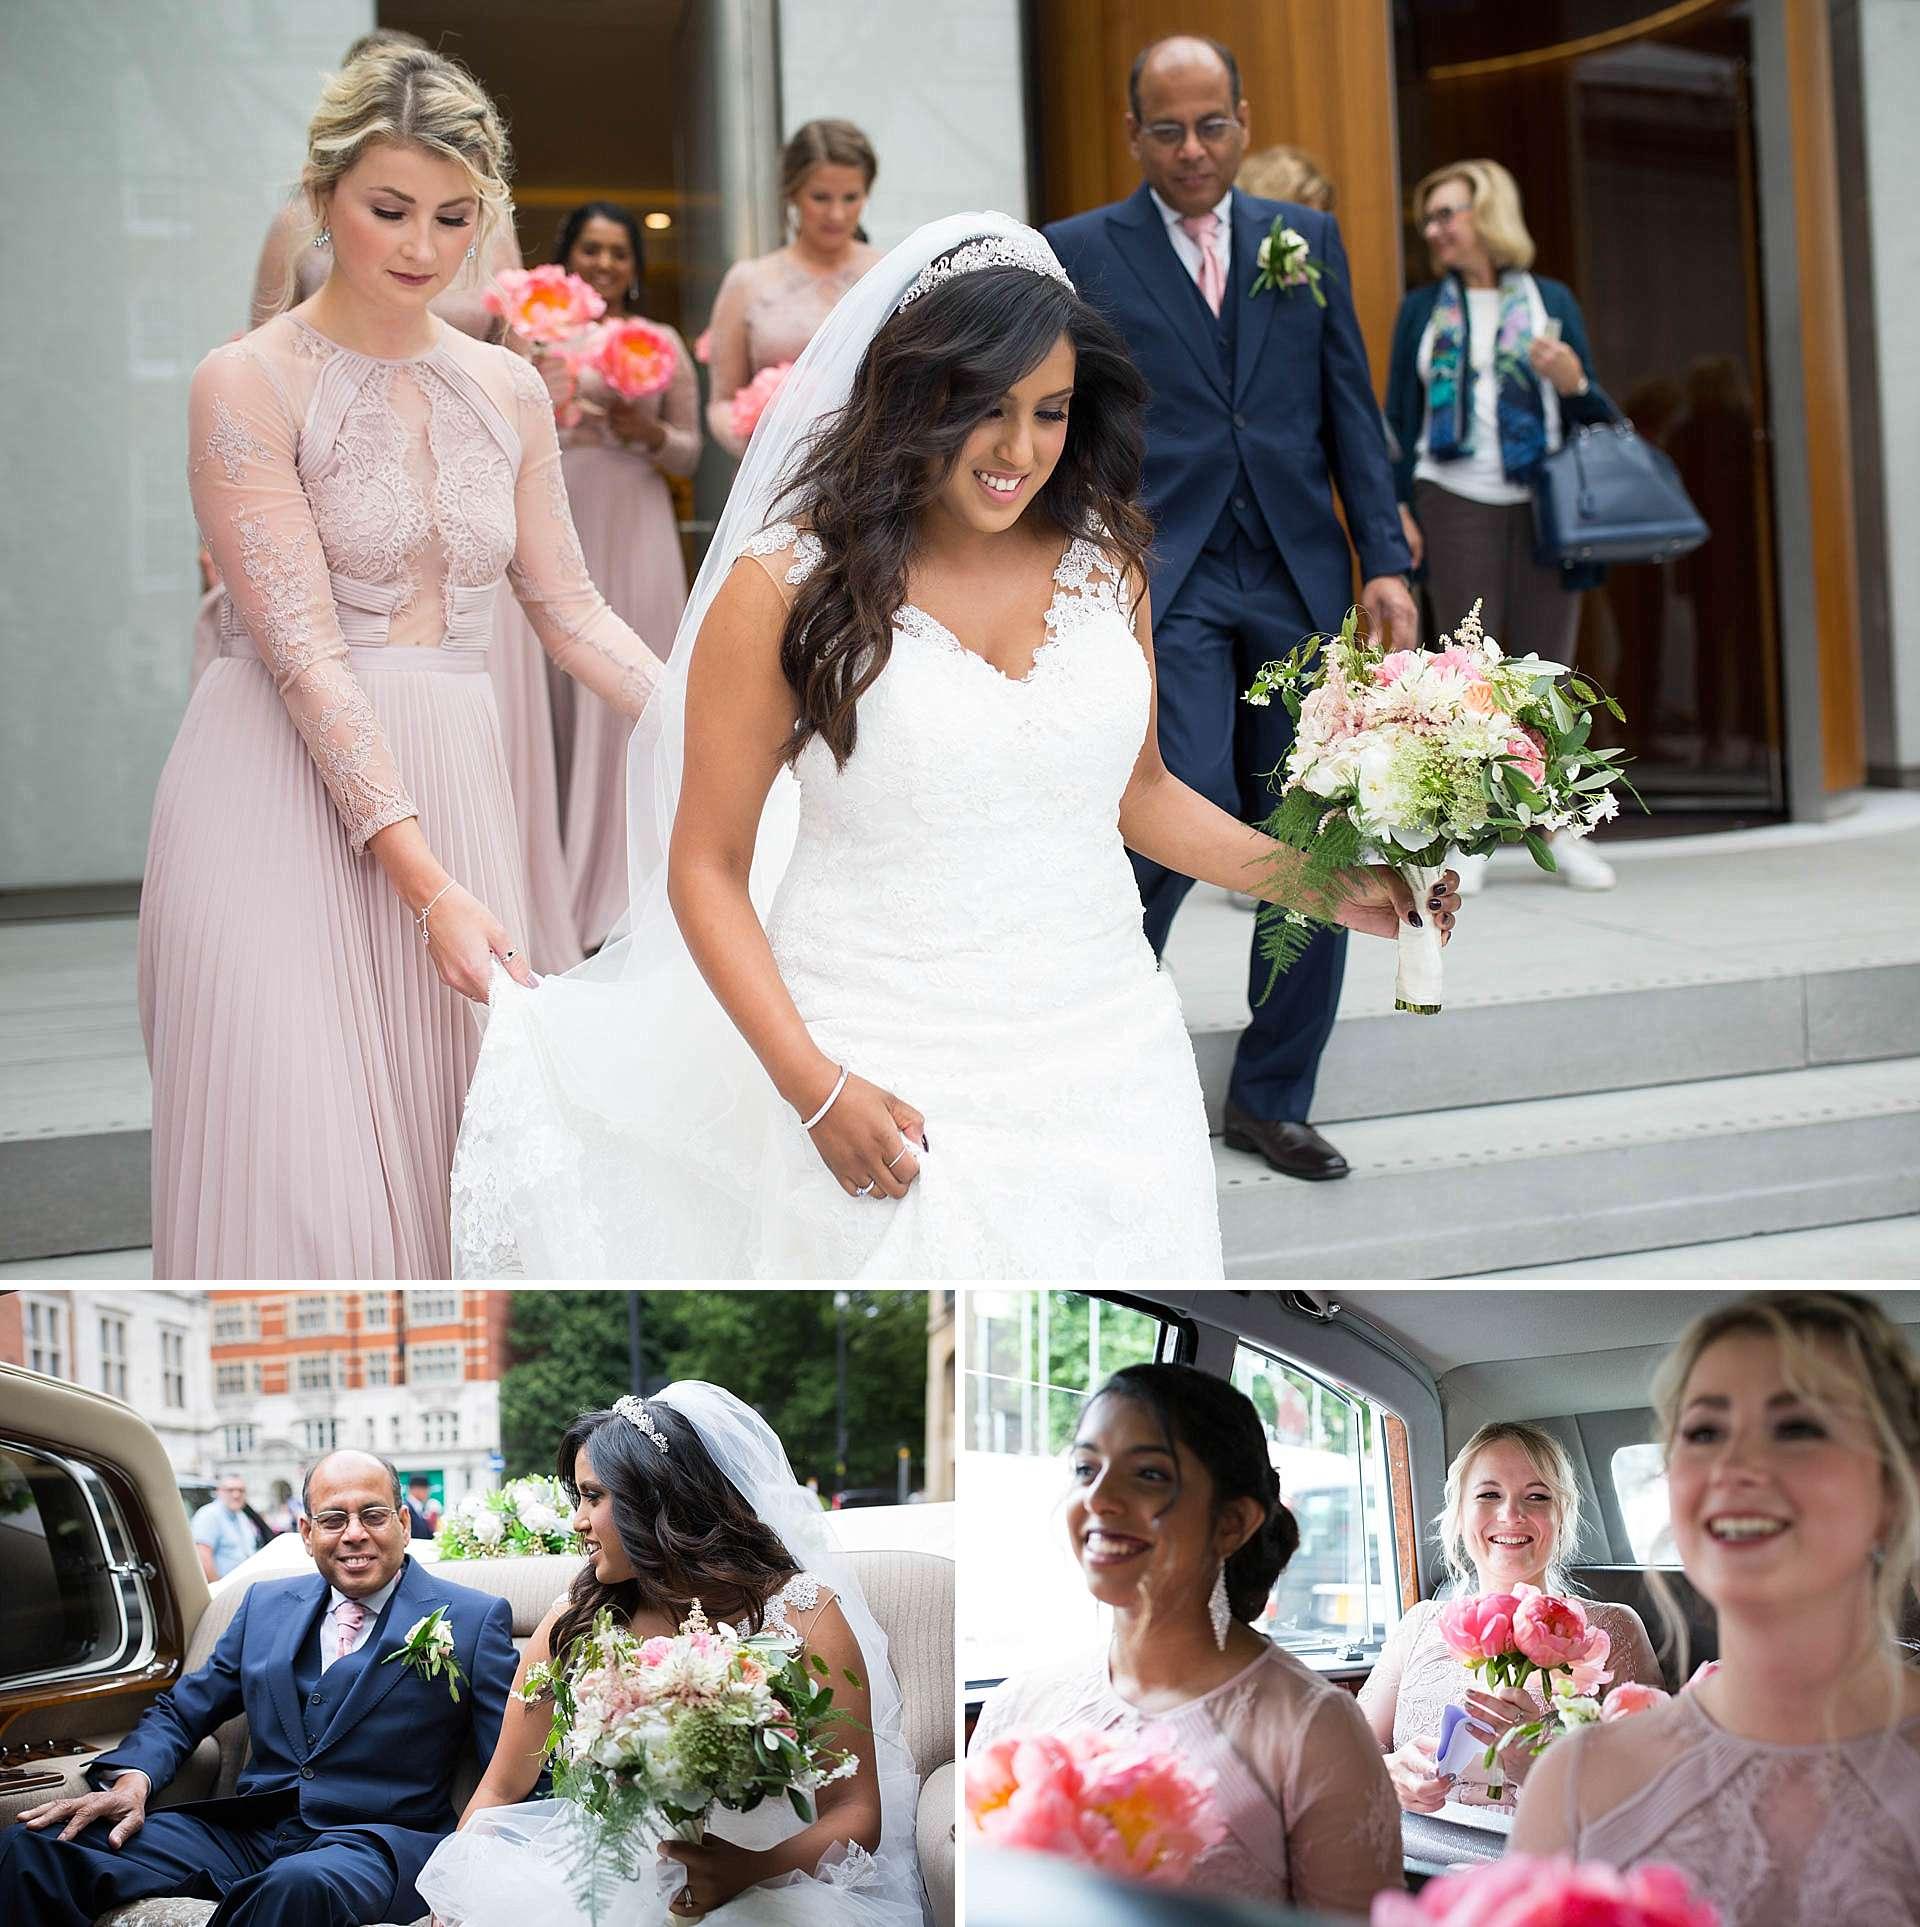 Average Wedding Photographer Cost Uk 2017: Mayfair And Knightsbridge Wedding